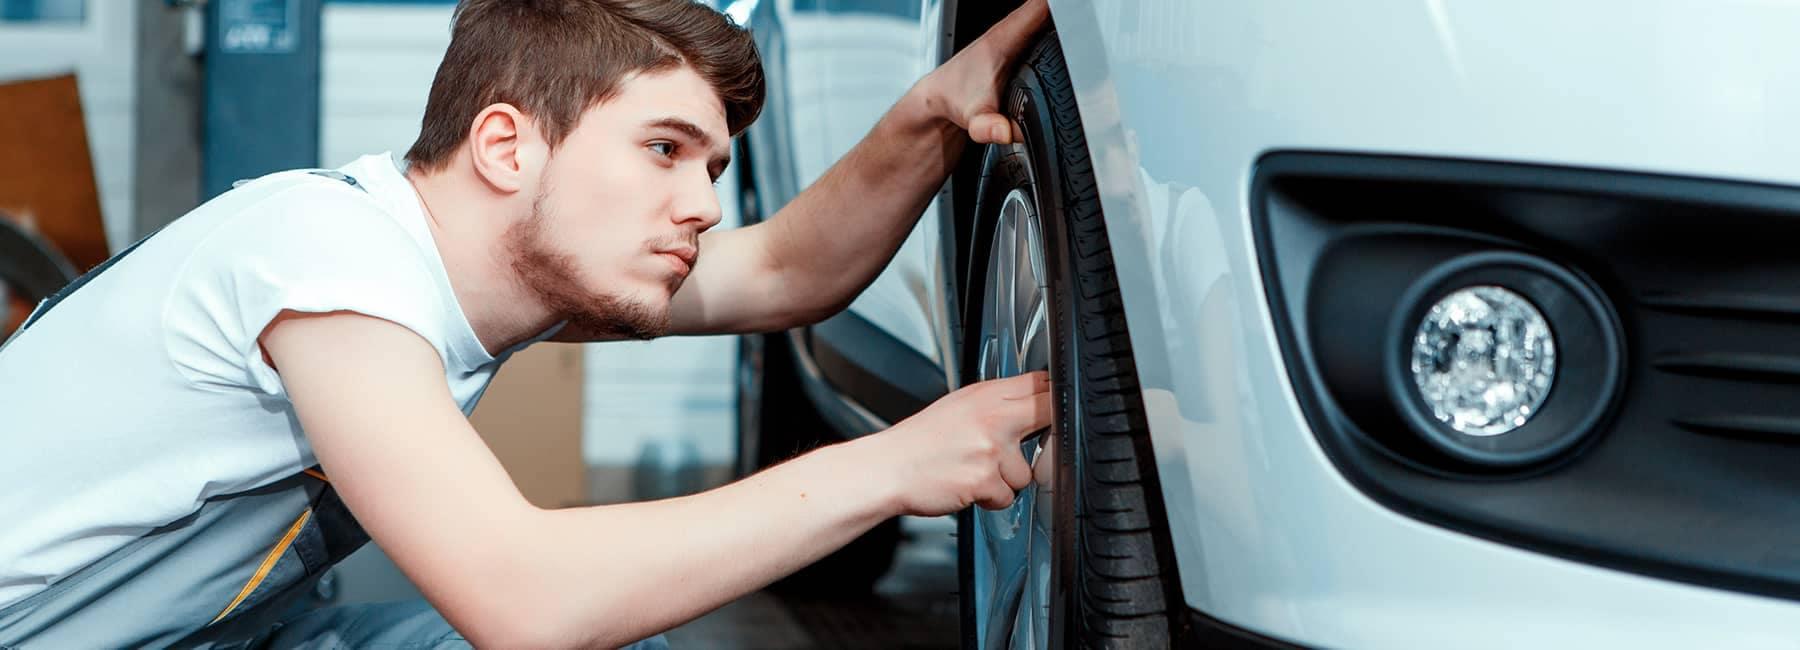 technician inspects car brakes